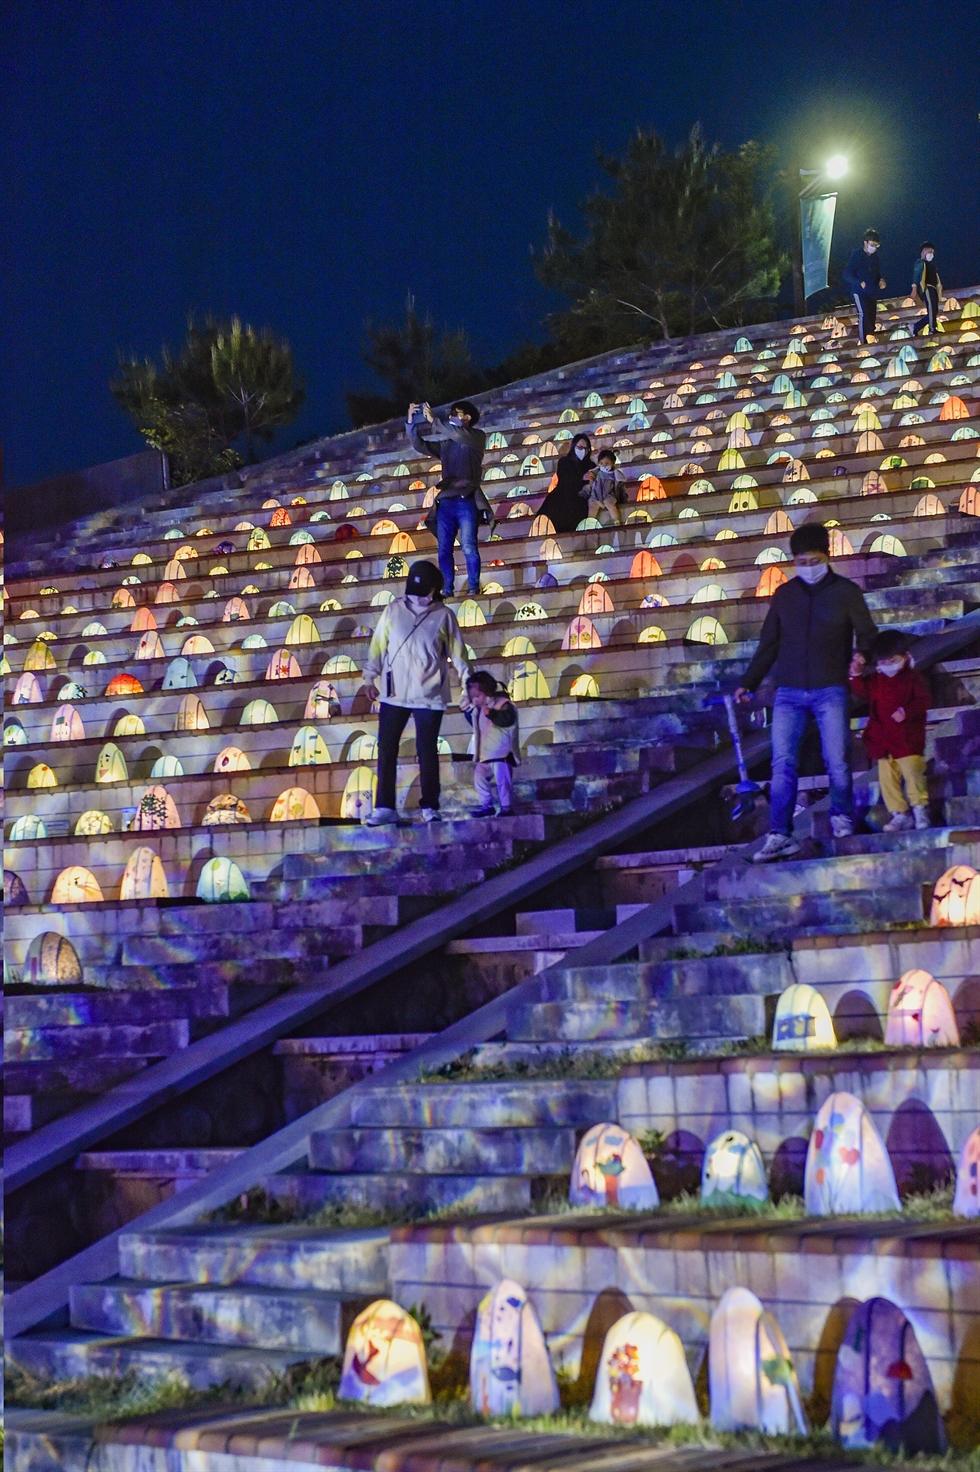 Visitors walk down stairs decorated with various hanji lanterns at